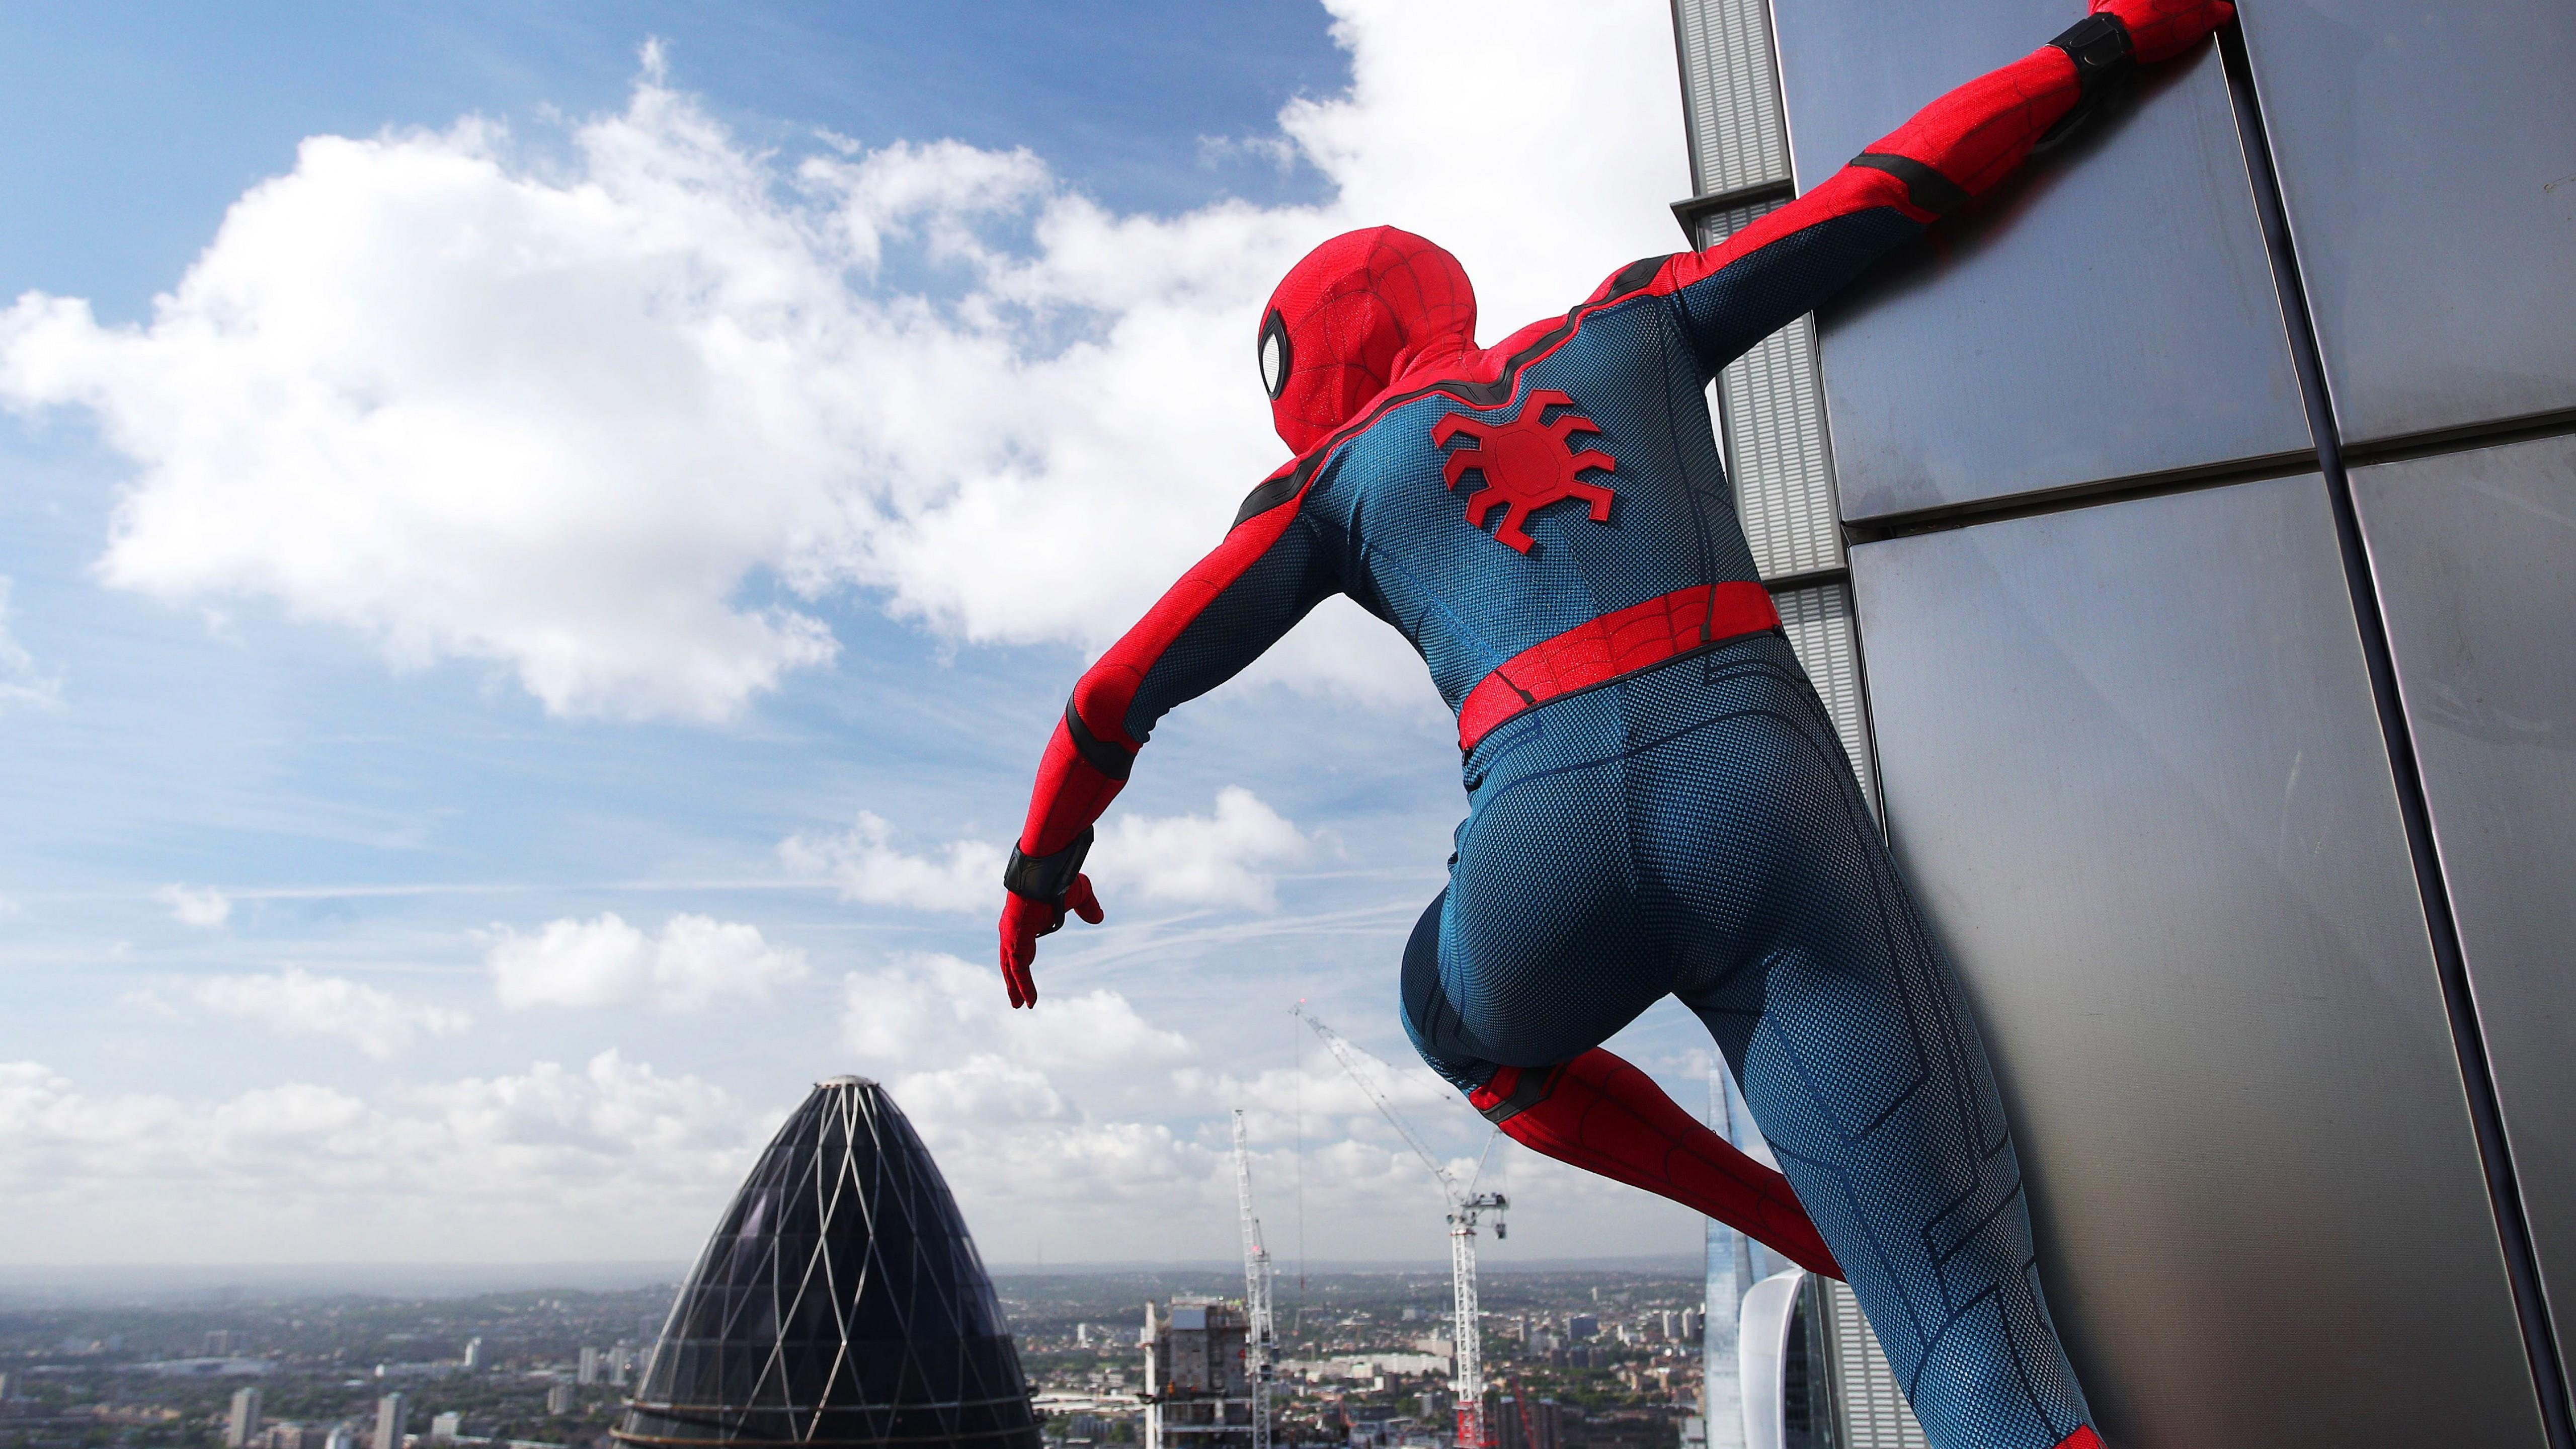 spider-man-homecoming-5120x2880-4k-7992